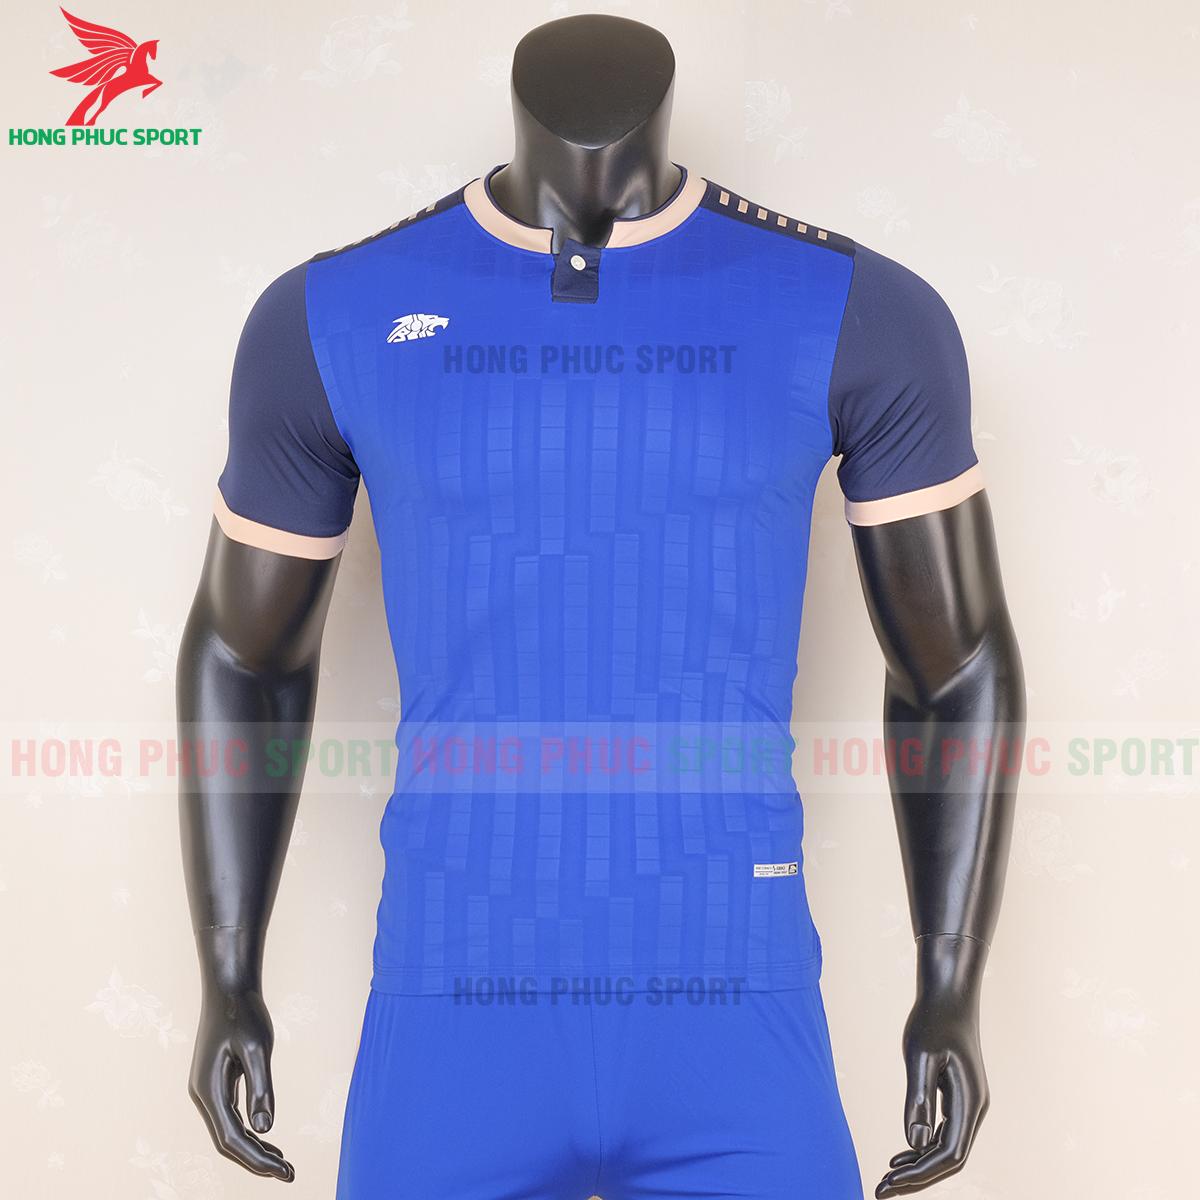 https://cdn.hongphucsport.com/unsafe/s4.shopbay.vn/files/285/ao-bong-da-khong-logo-riki-neck-xanh-duong-5-5f71afcb331e1.png